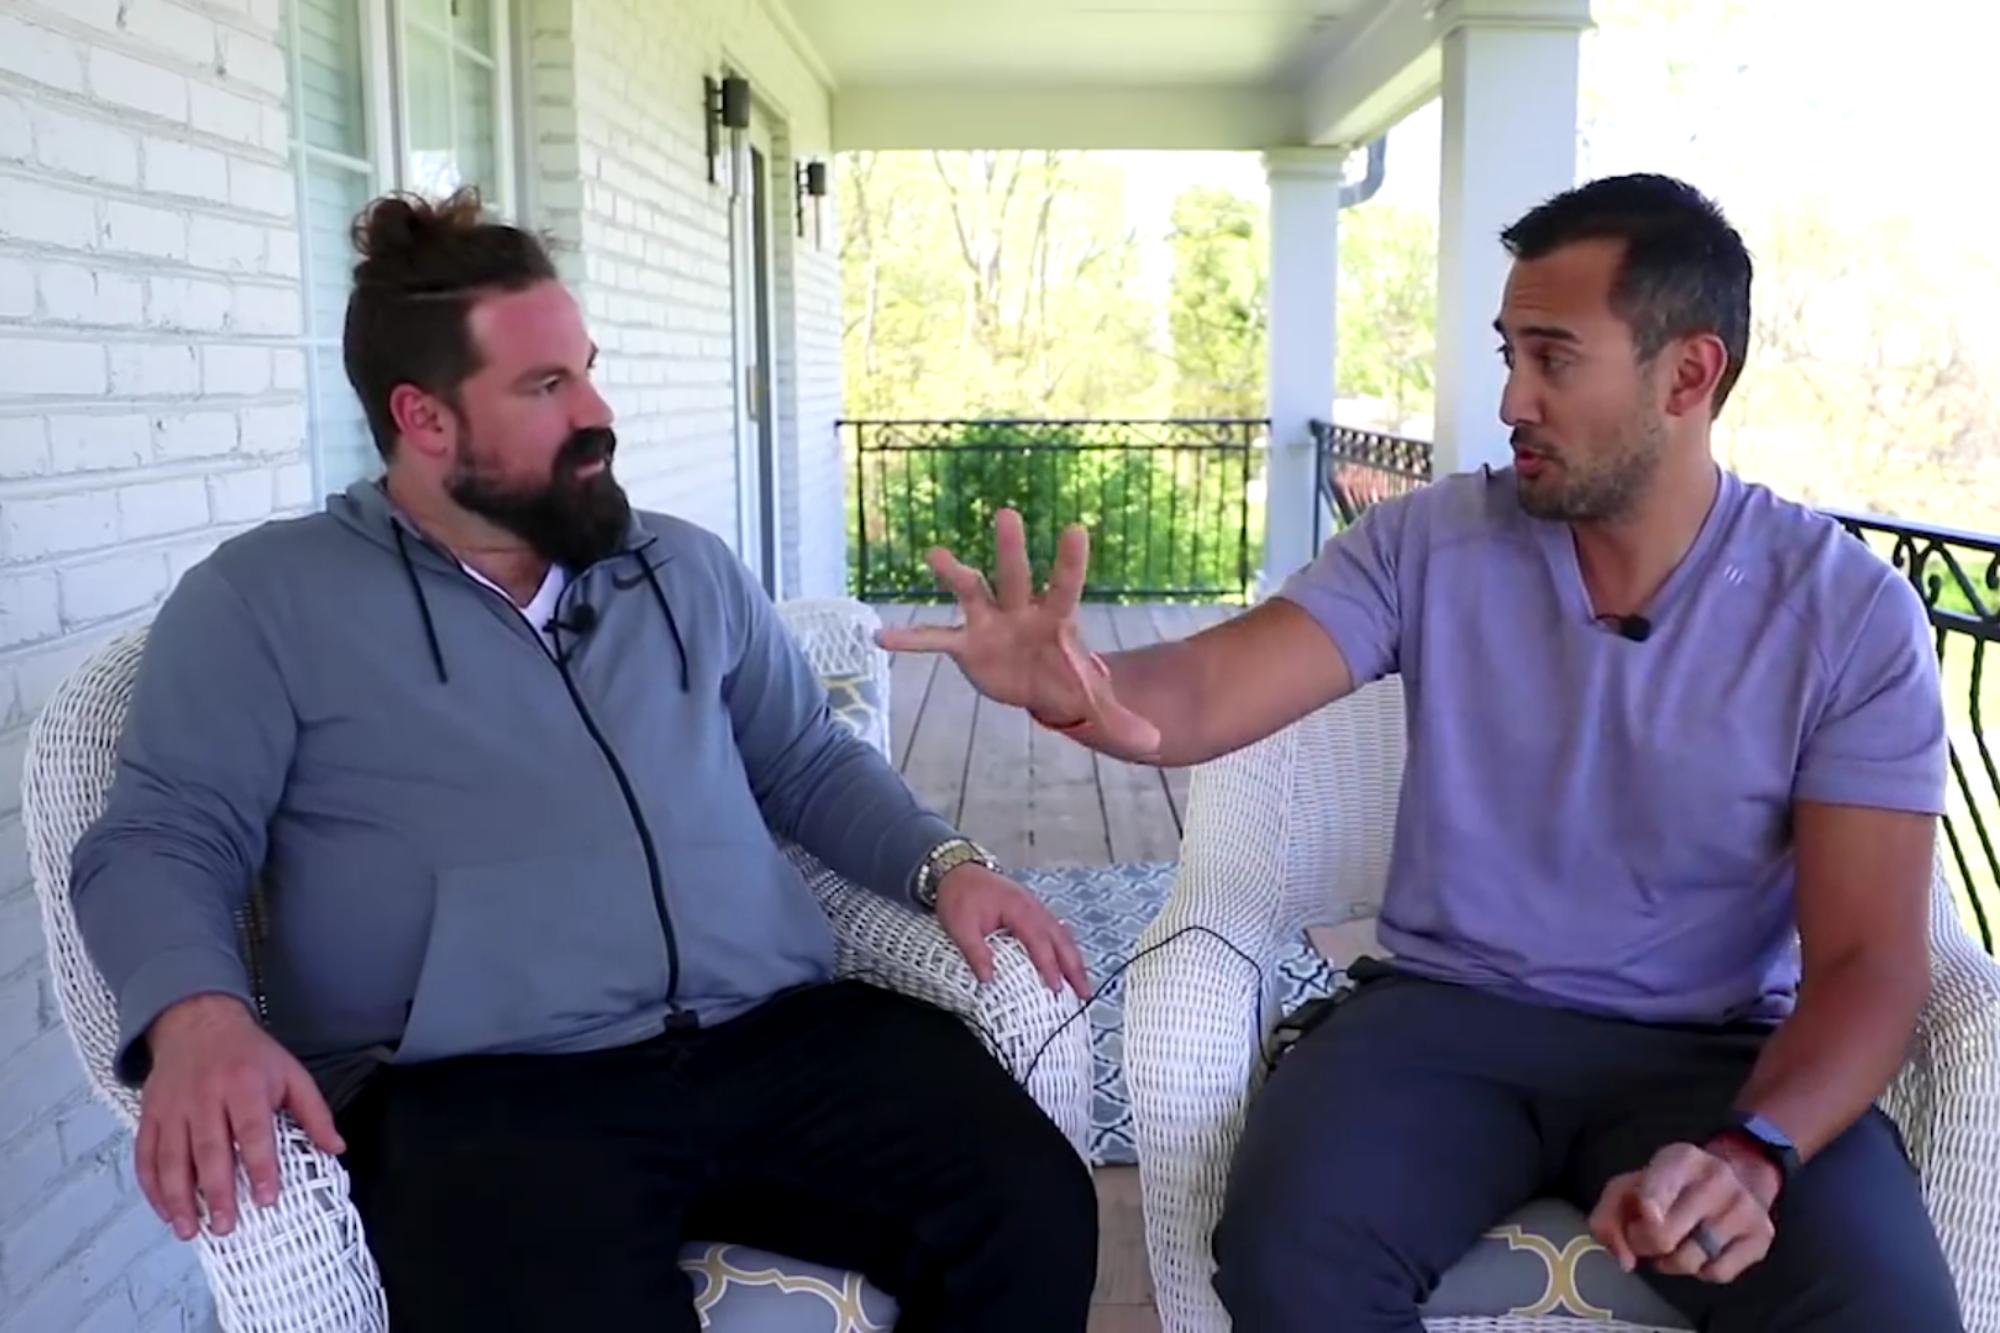 How This Digital Marketing Guru Went From Being Flat Broke to Making Millions